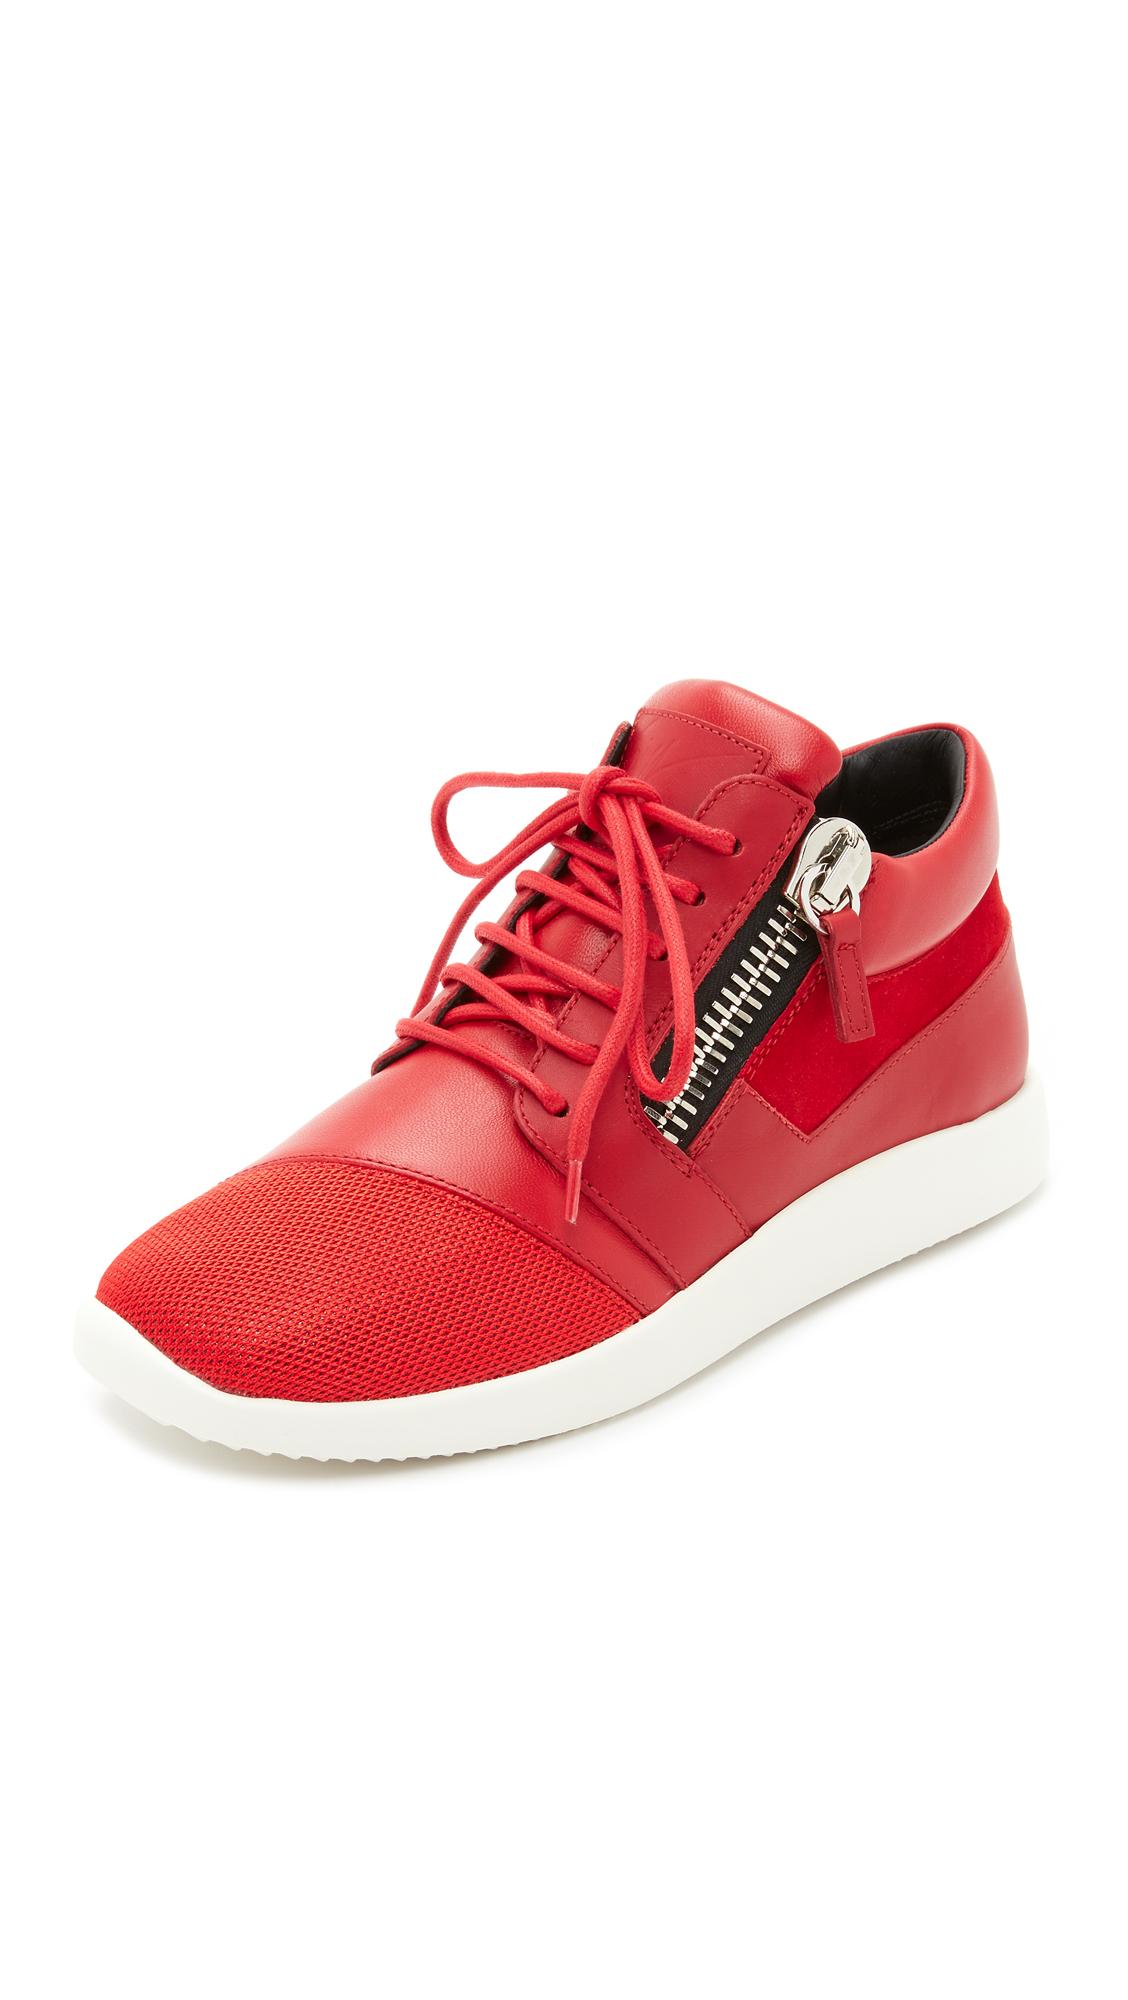 Giuseppe Zanotti Sneakers - Red